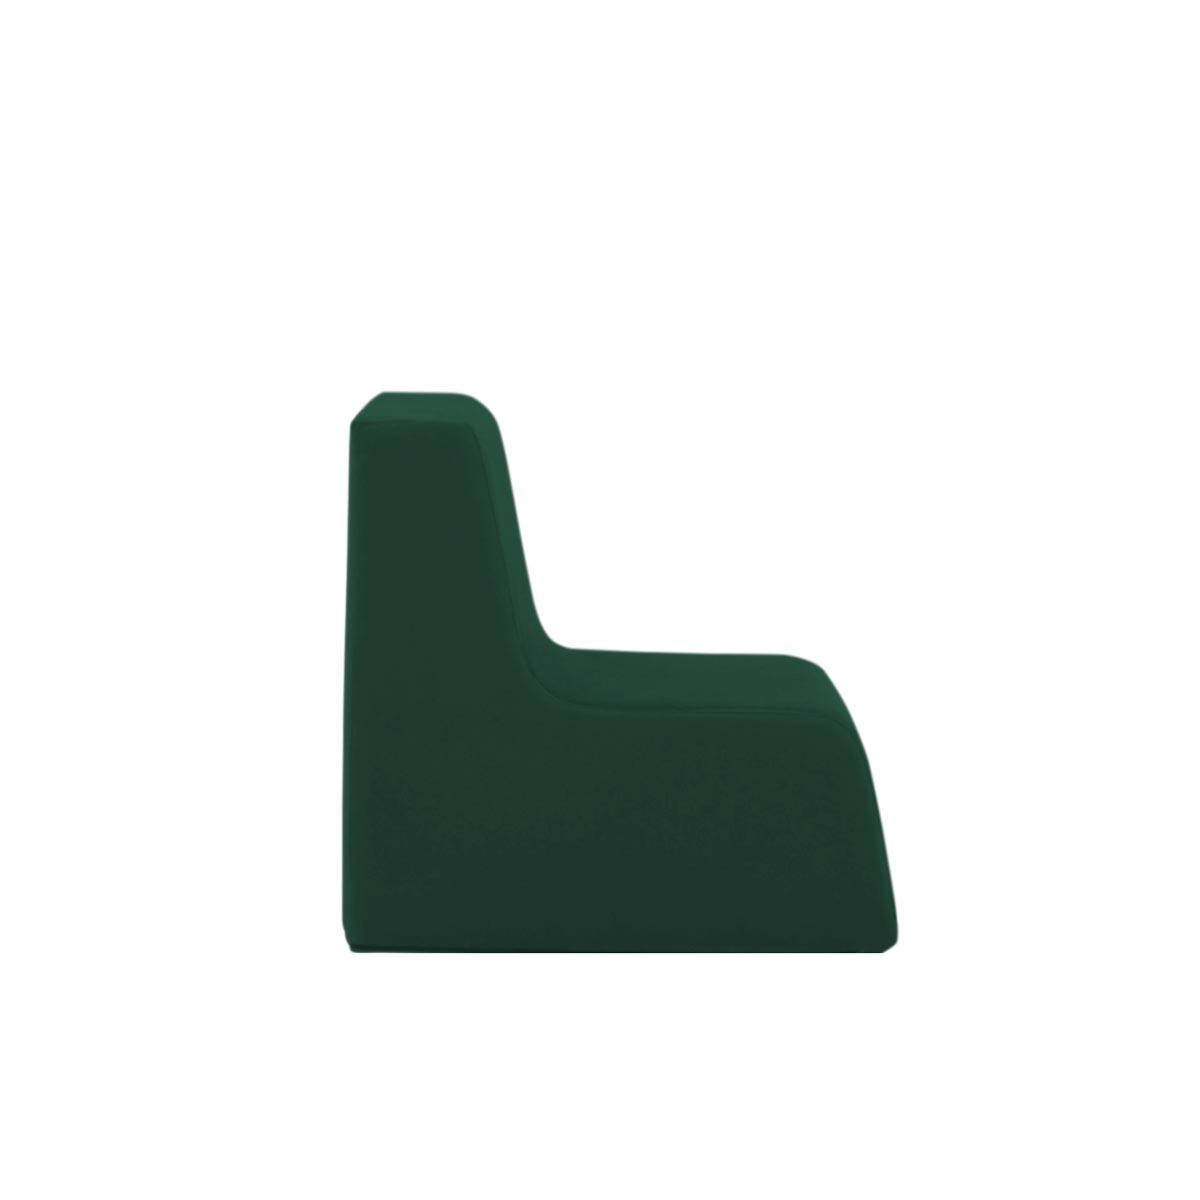 Poltroninha Muss r02 Tecido Lonita Verde Bistro 03